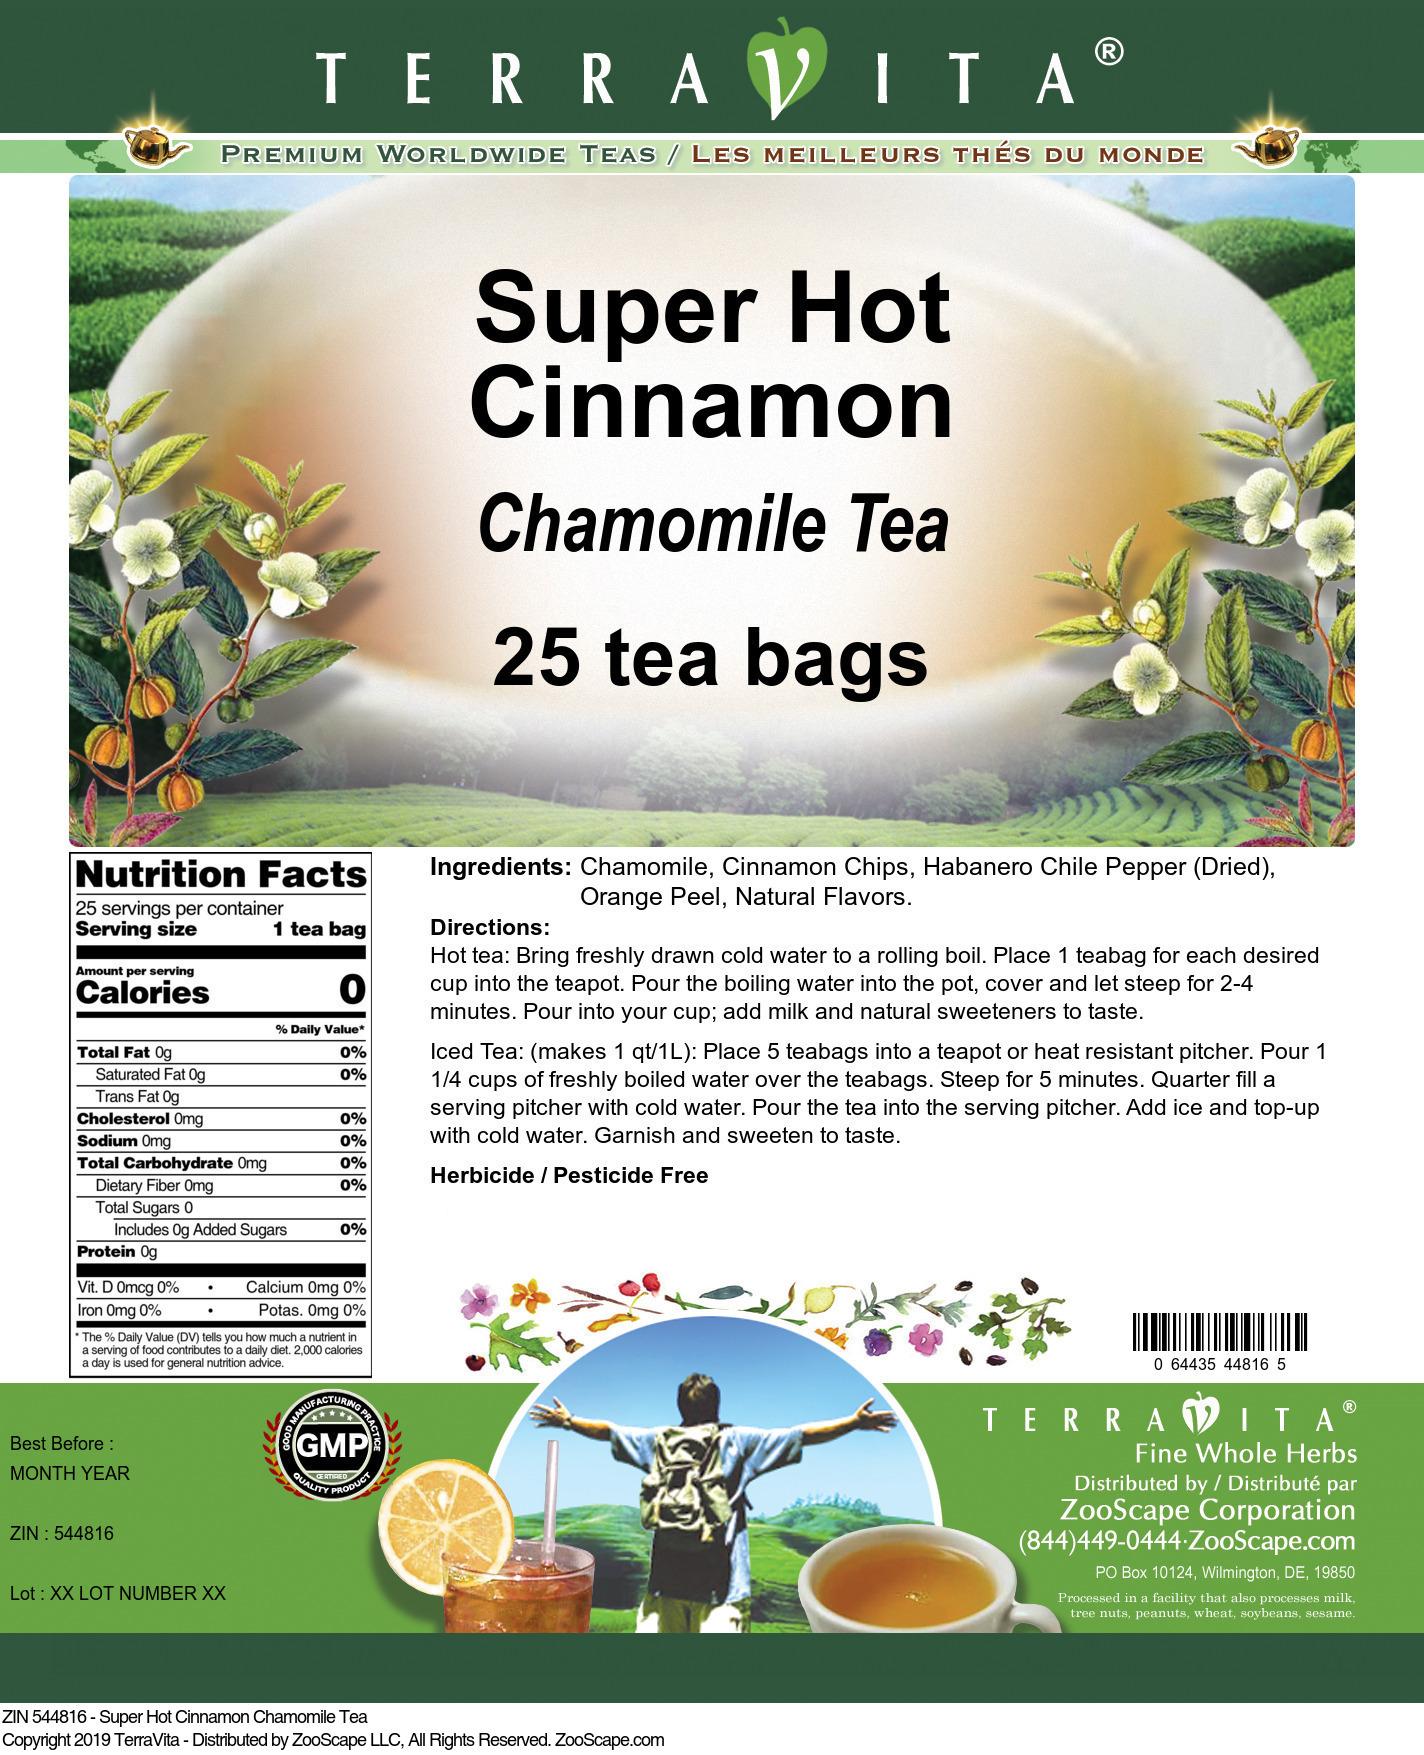 Super Hot Cinnamon Chamomile Tea